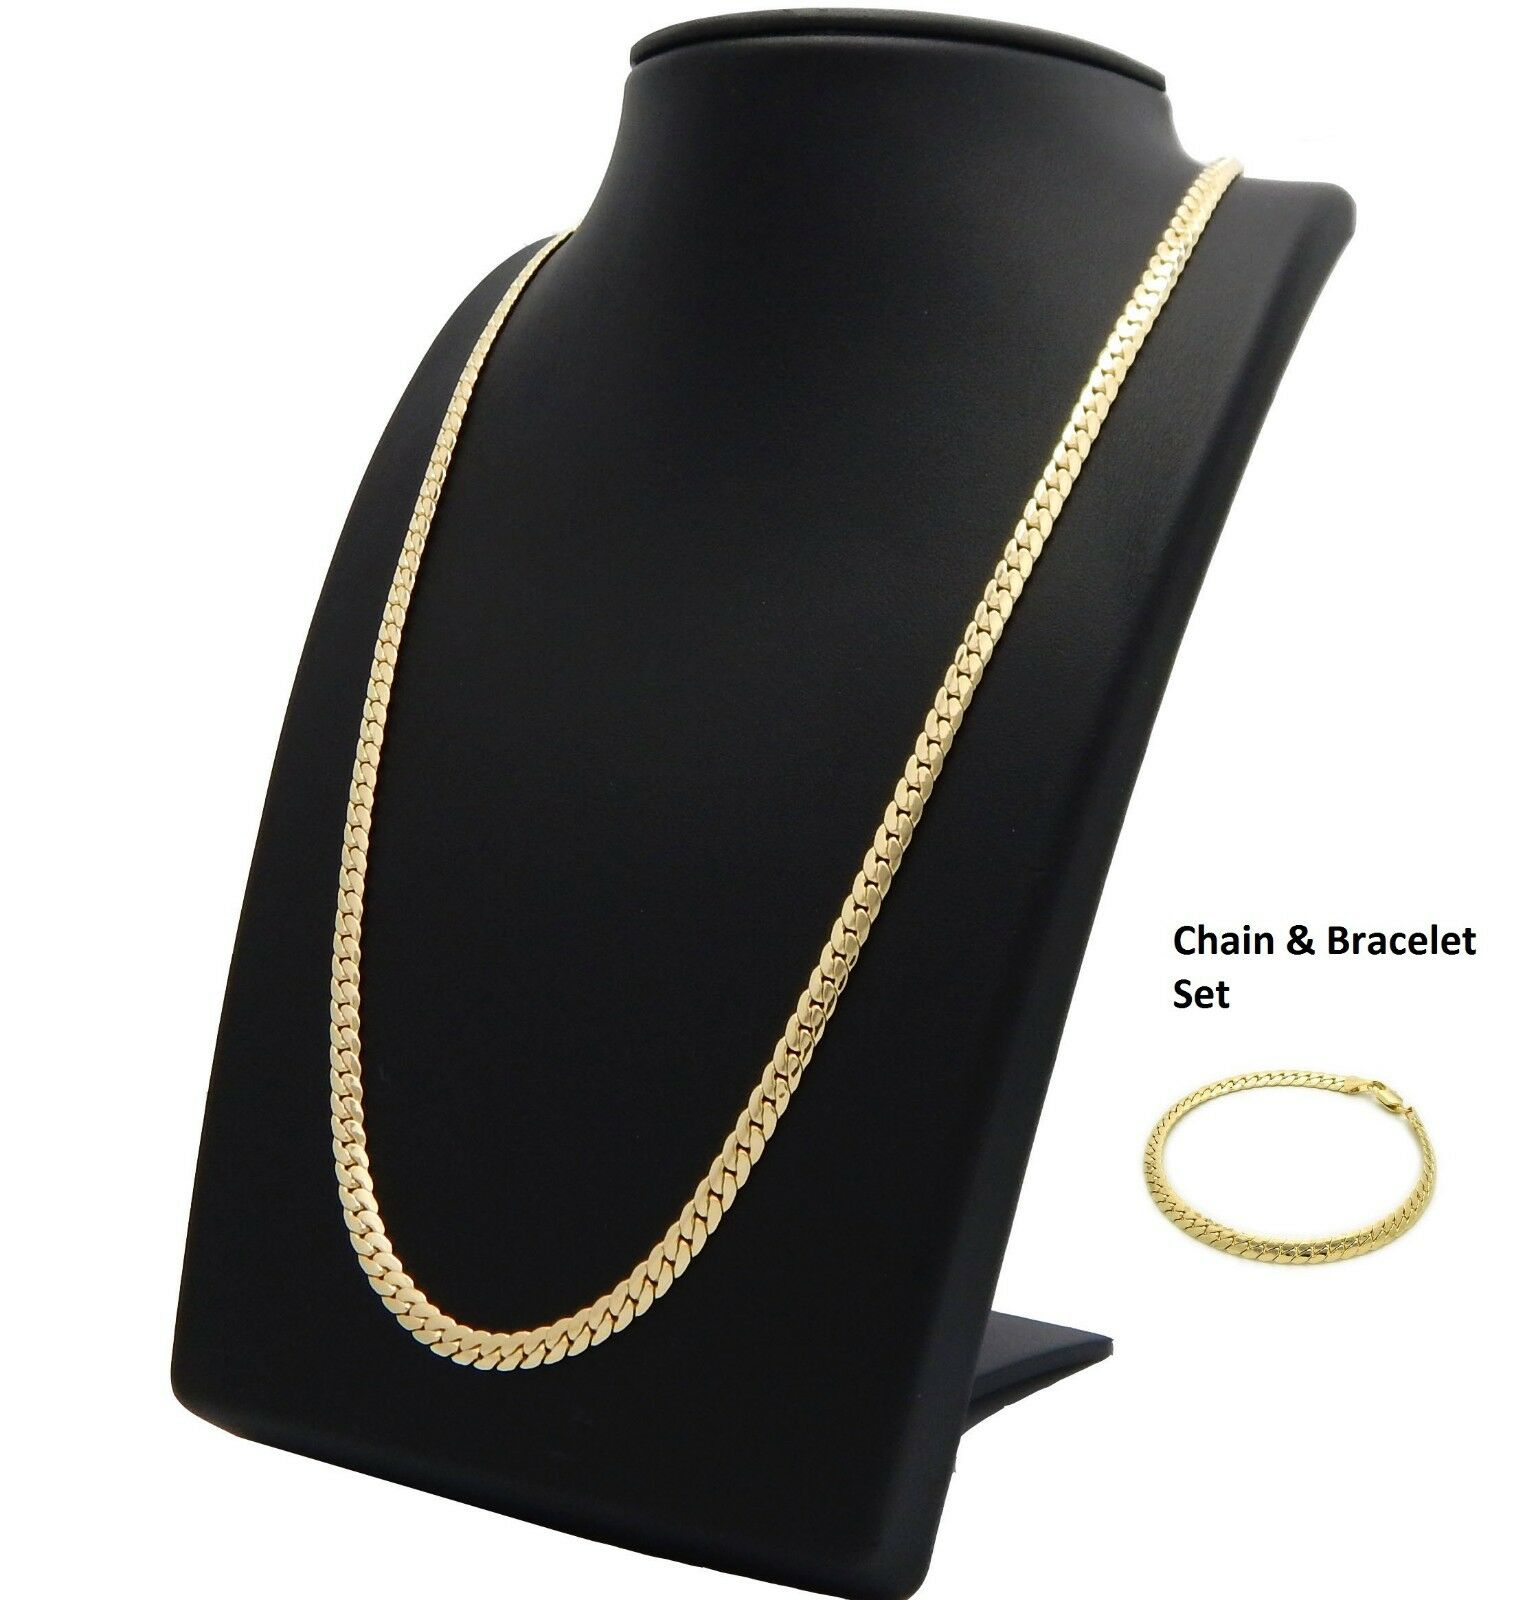 14k Mens Miami Cuban link Chain & Bracelet Set Gold Plated 5